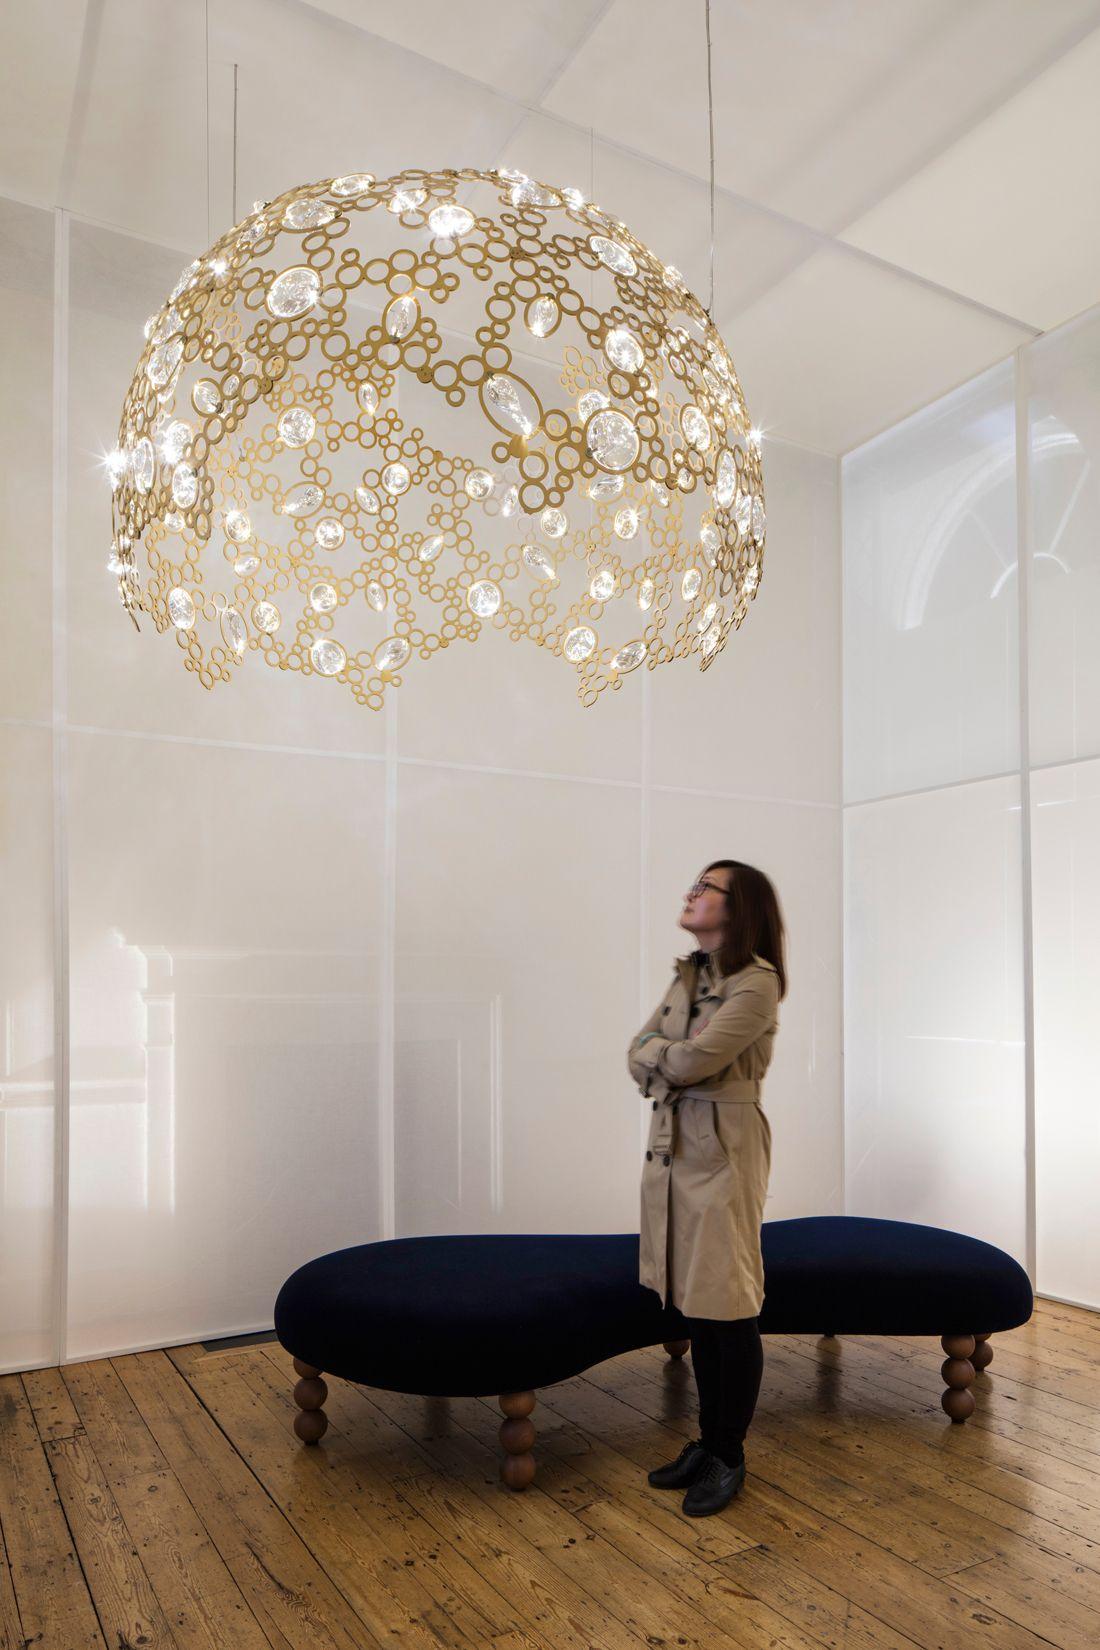 LightInTheBox LED Crystal Chandelier Lihting Transparent Crystal Round 4 Rings 20CM Plus 40CM Plus 60CM Plus 80CM Lamps Fixtures